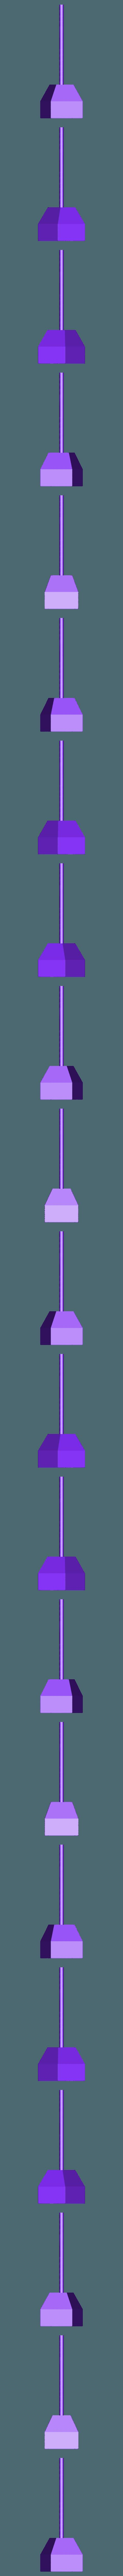 Carp_4.stl Download OBJ file Carp Fancy • Object to 3D print, Dynastinae